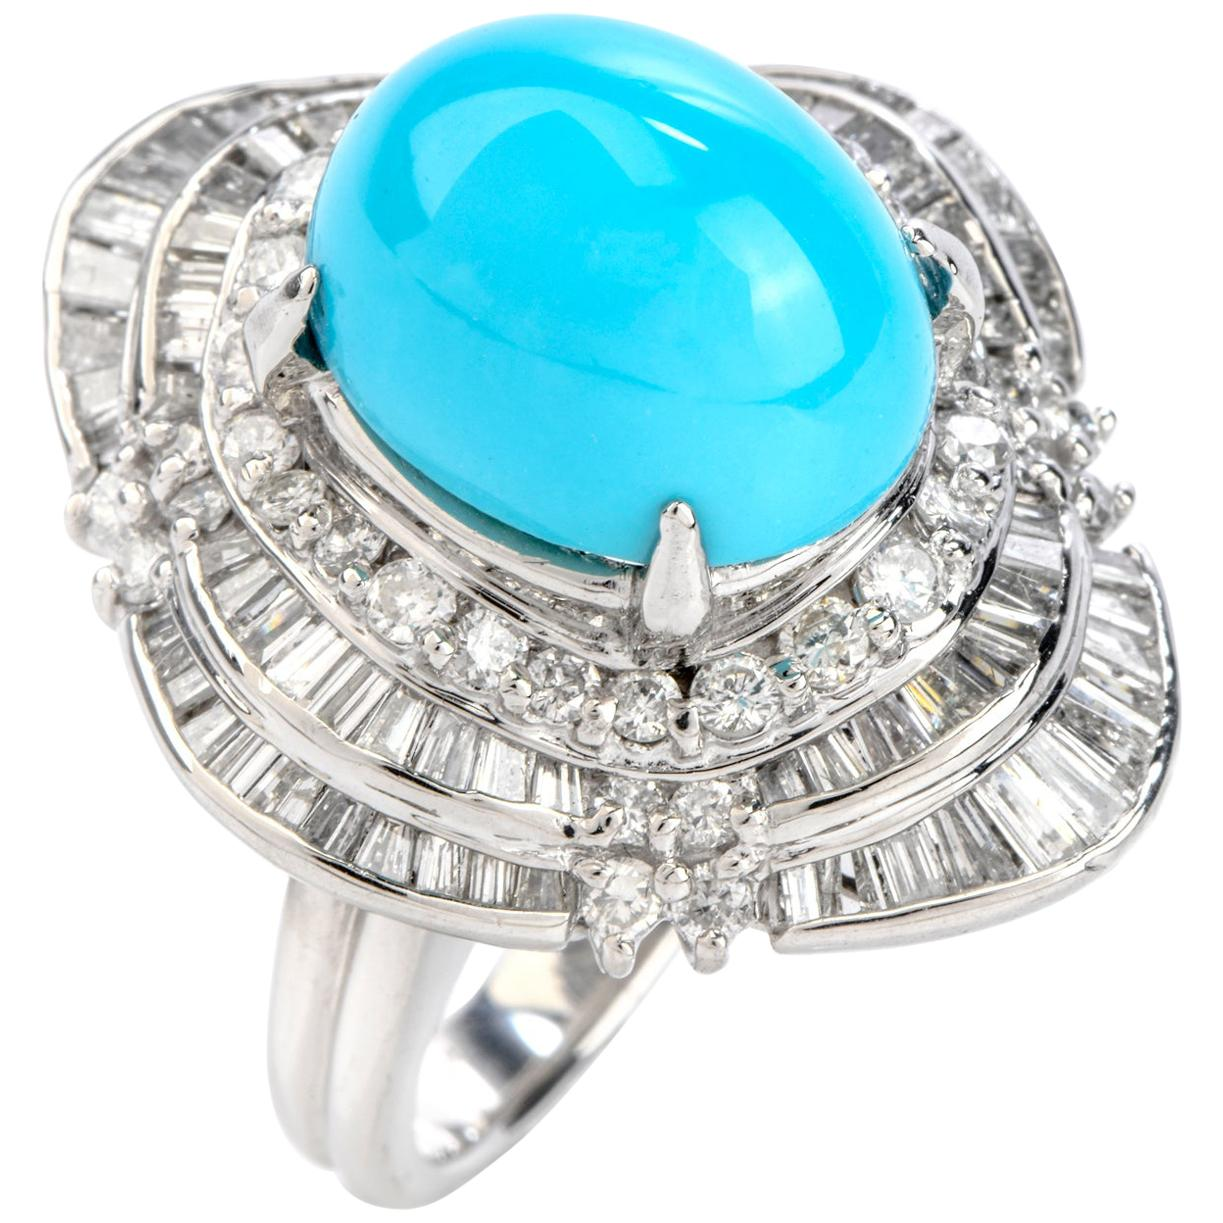 1980s Turquoise Diamond Platinum Ballerina Cocktail Ring